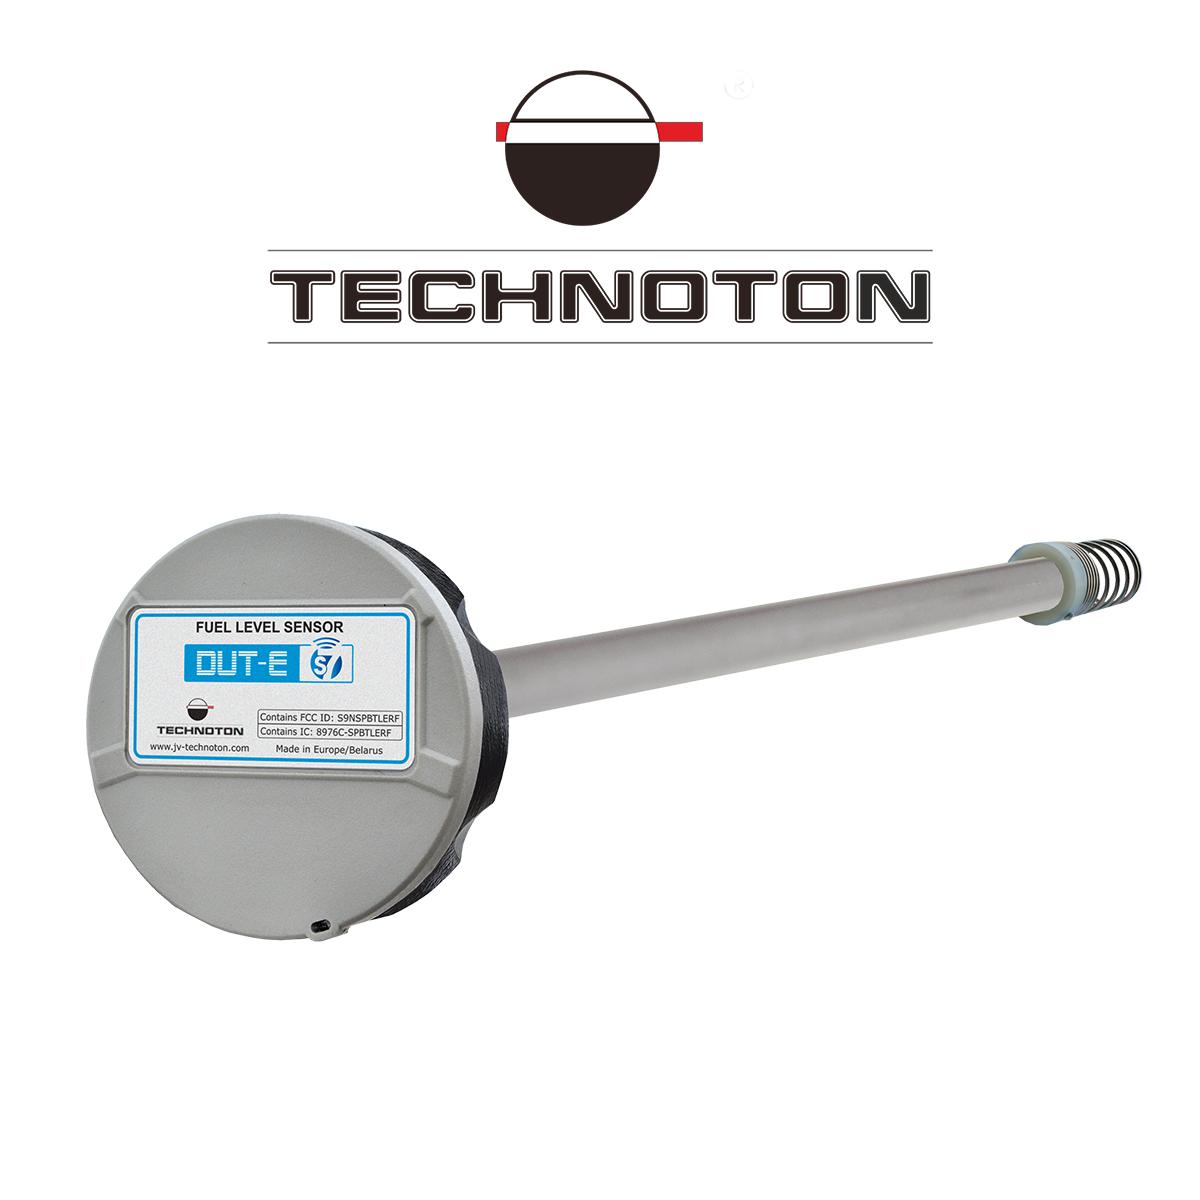 Wireless tank level sensor